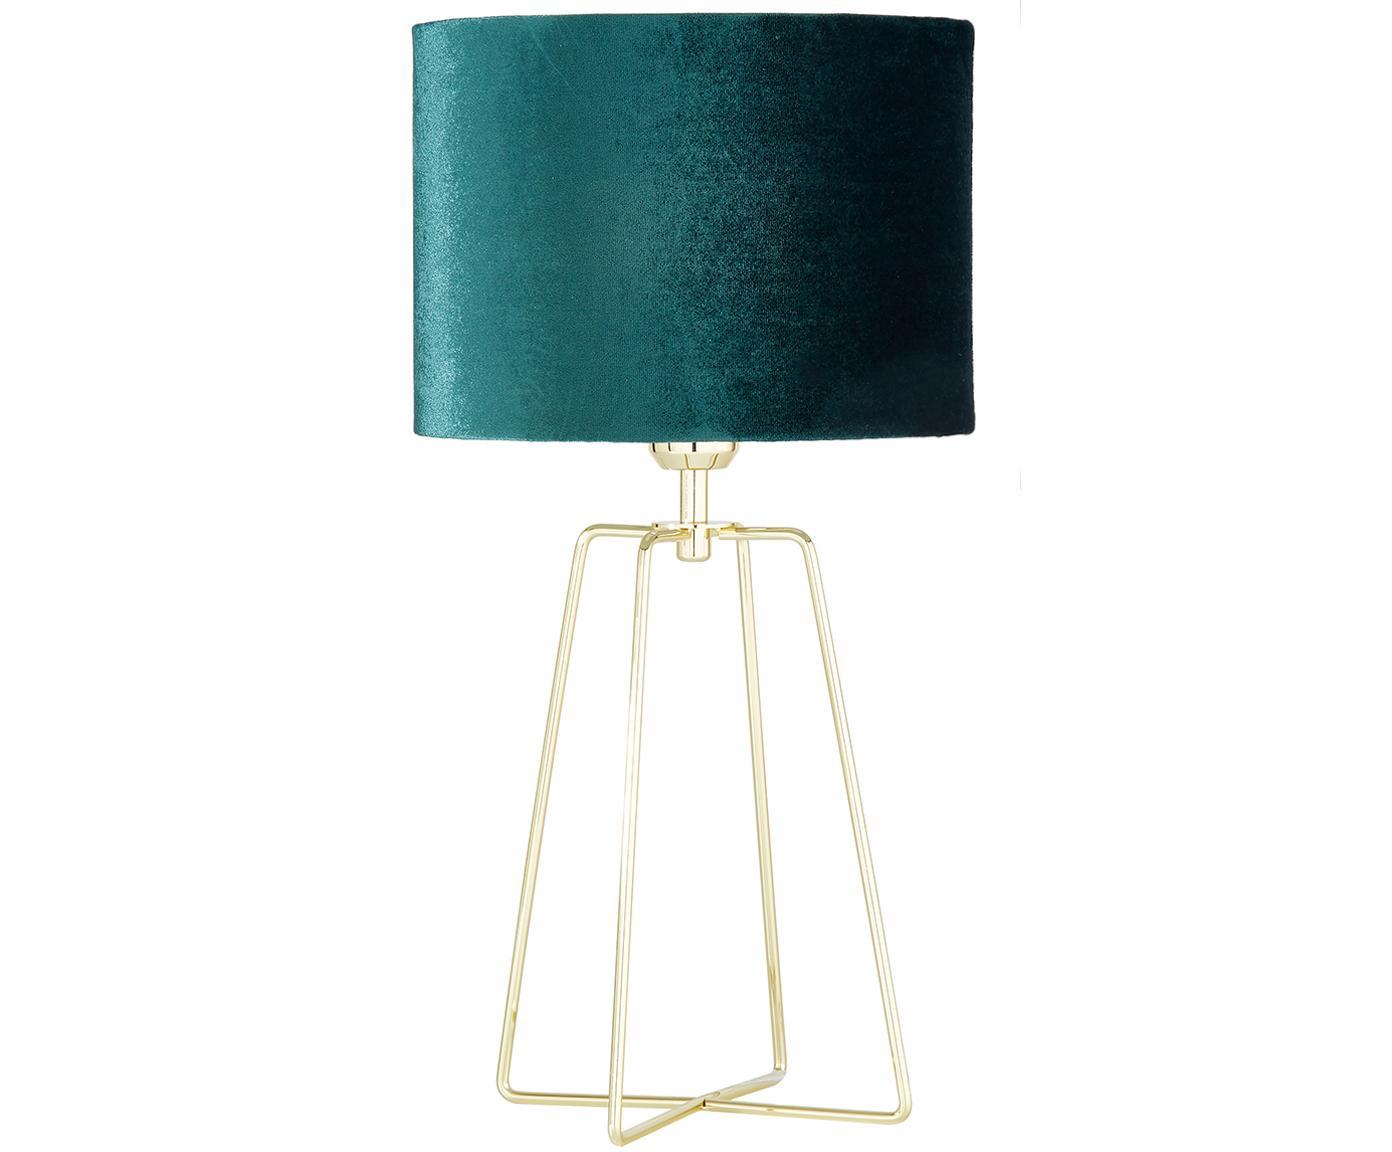 Tischleuchte Karolina, Lampenschirm: Samt, Lampenschirm: Dunkelgrün Lampenfuss: Messing, glänzend Kabel: Transparent, Ø 25 x H 49 cm